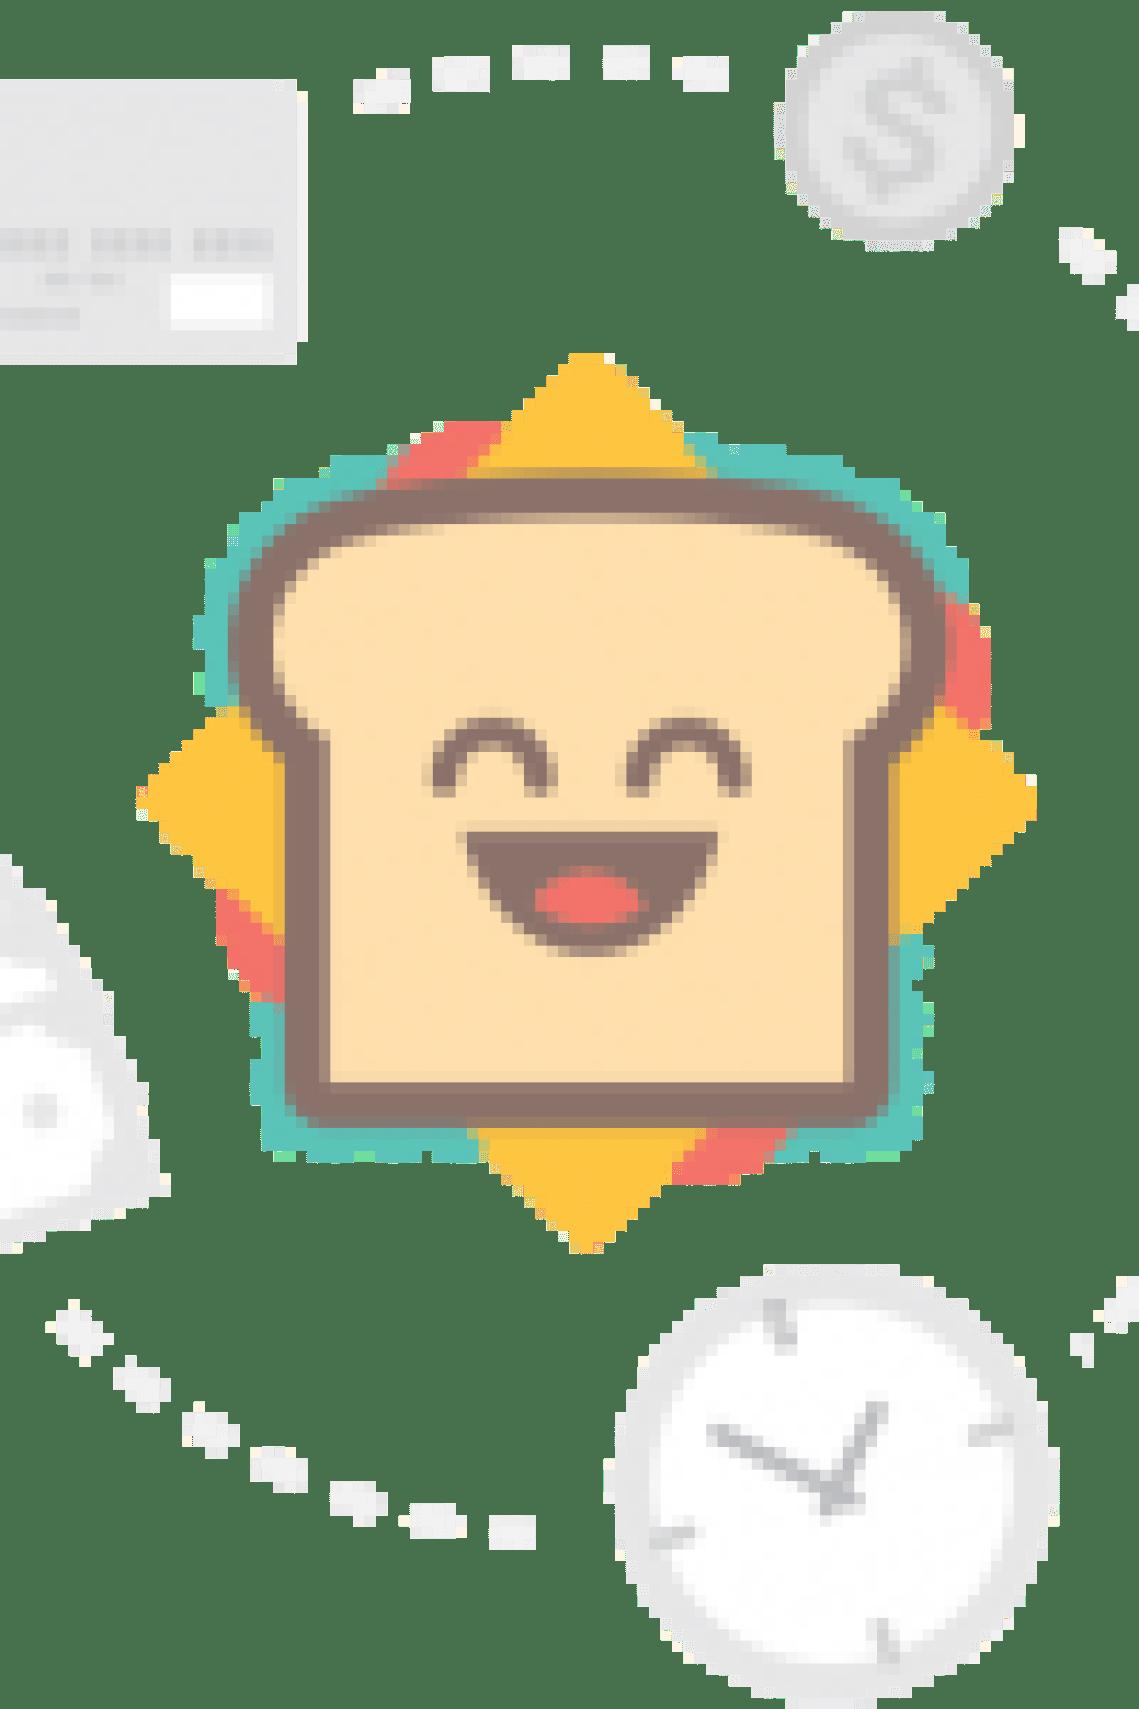 spring street style tumblr girl blonde casual outfit denim ootd look lookbook perfect pants